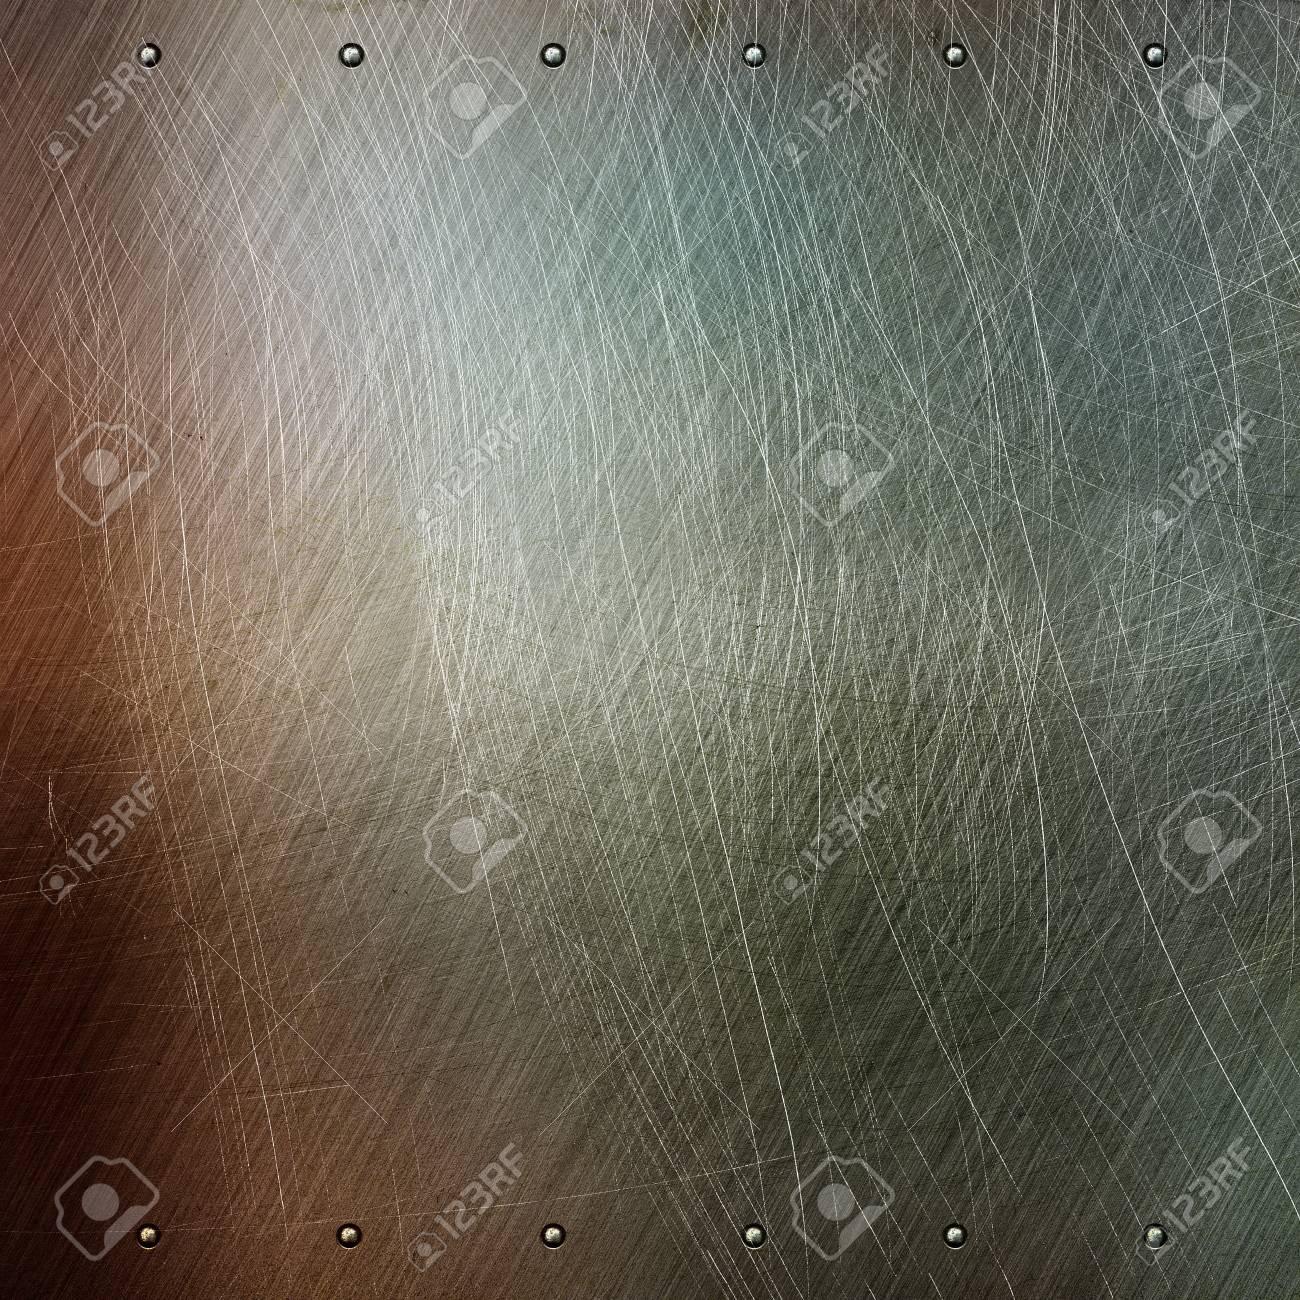 Brushed metal texture, grunge background Stock Photo - 15694934